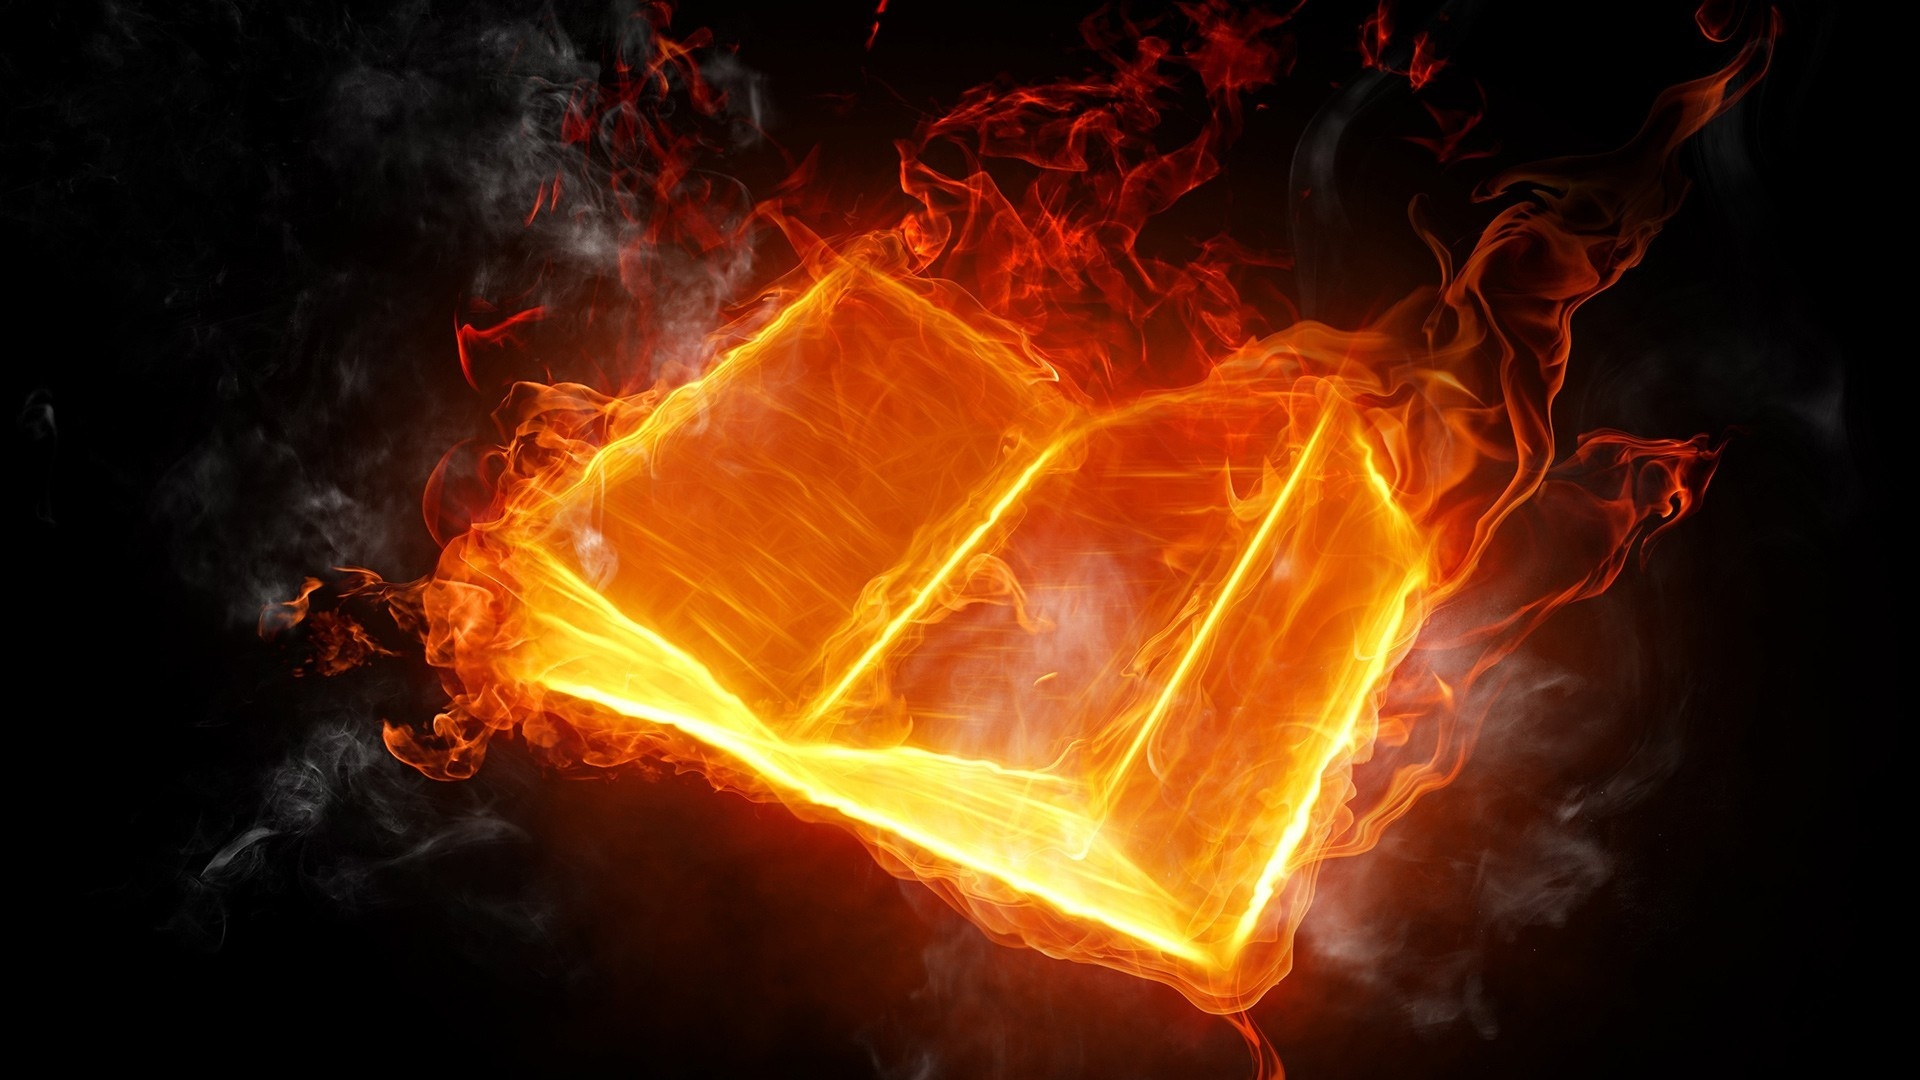 Abstract-design-burning-fire-book_1920x1080.jpg